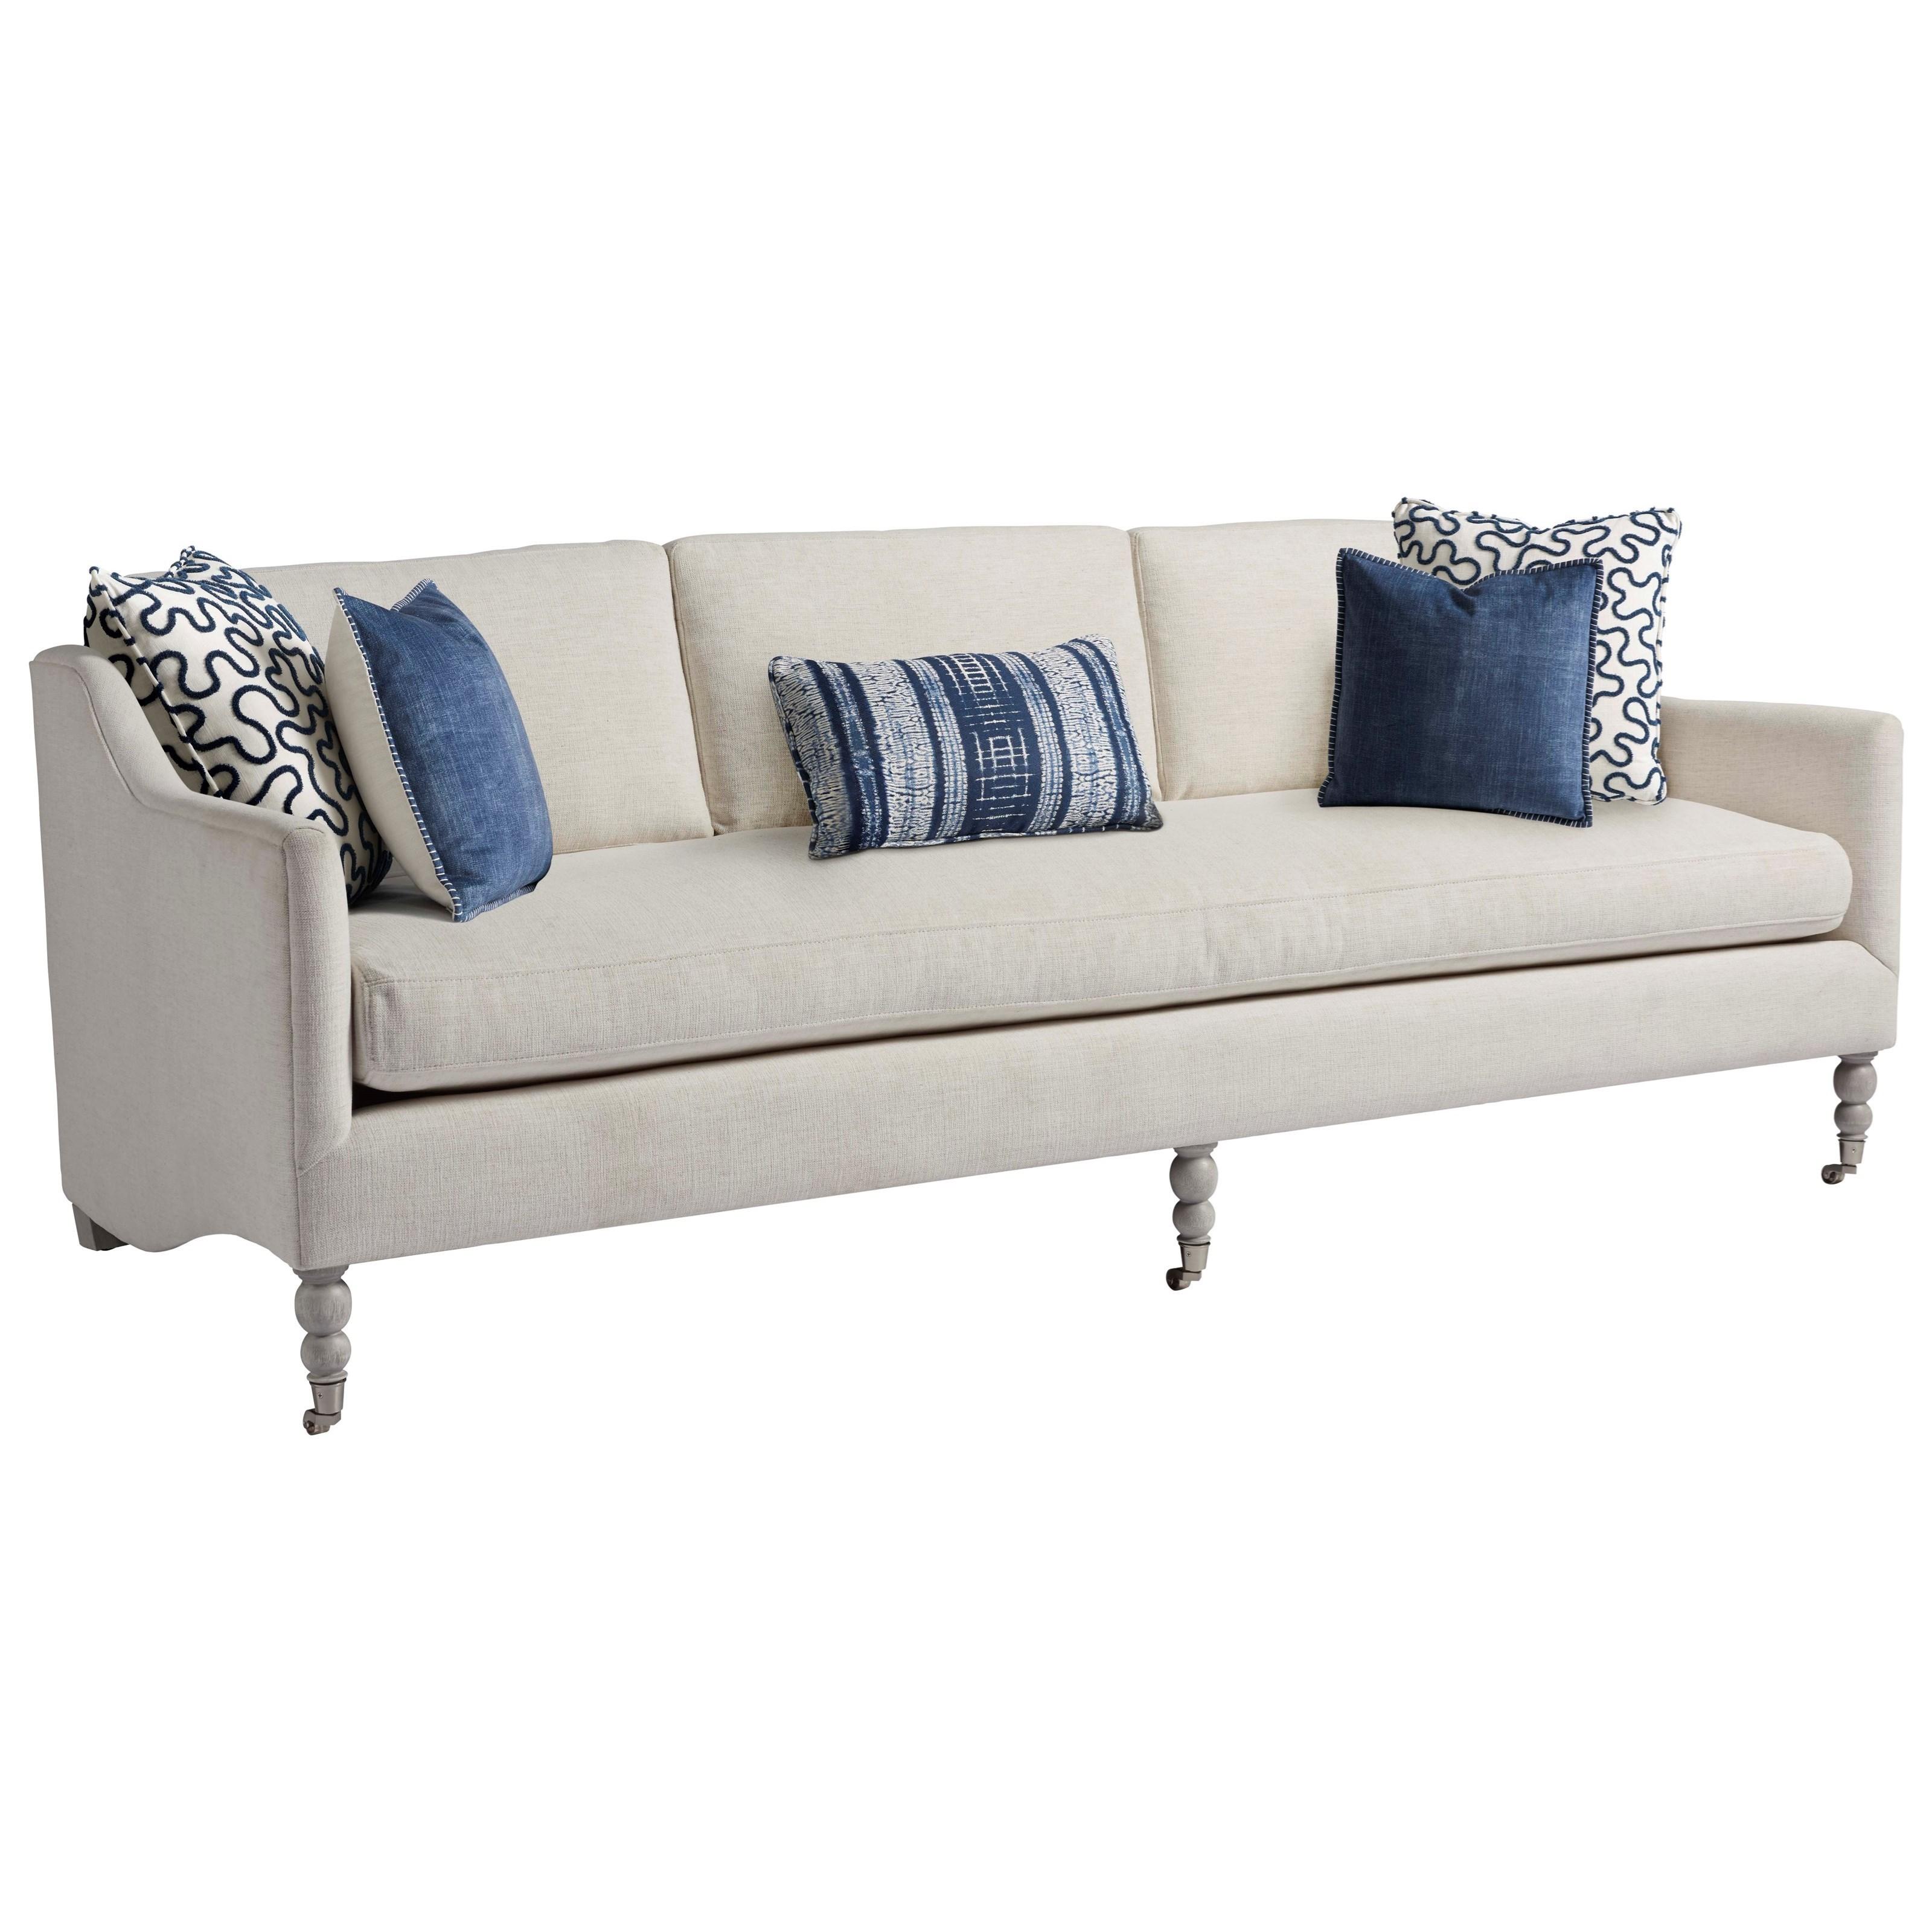 Coastal Living Home - Escape Kiawah Sofa by Universal at Baer's Furniture